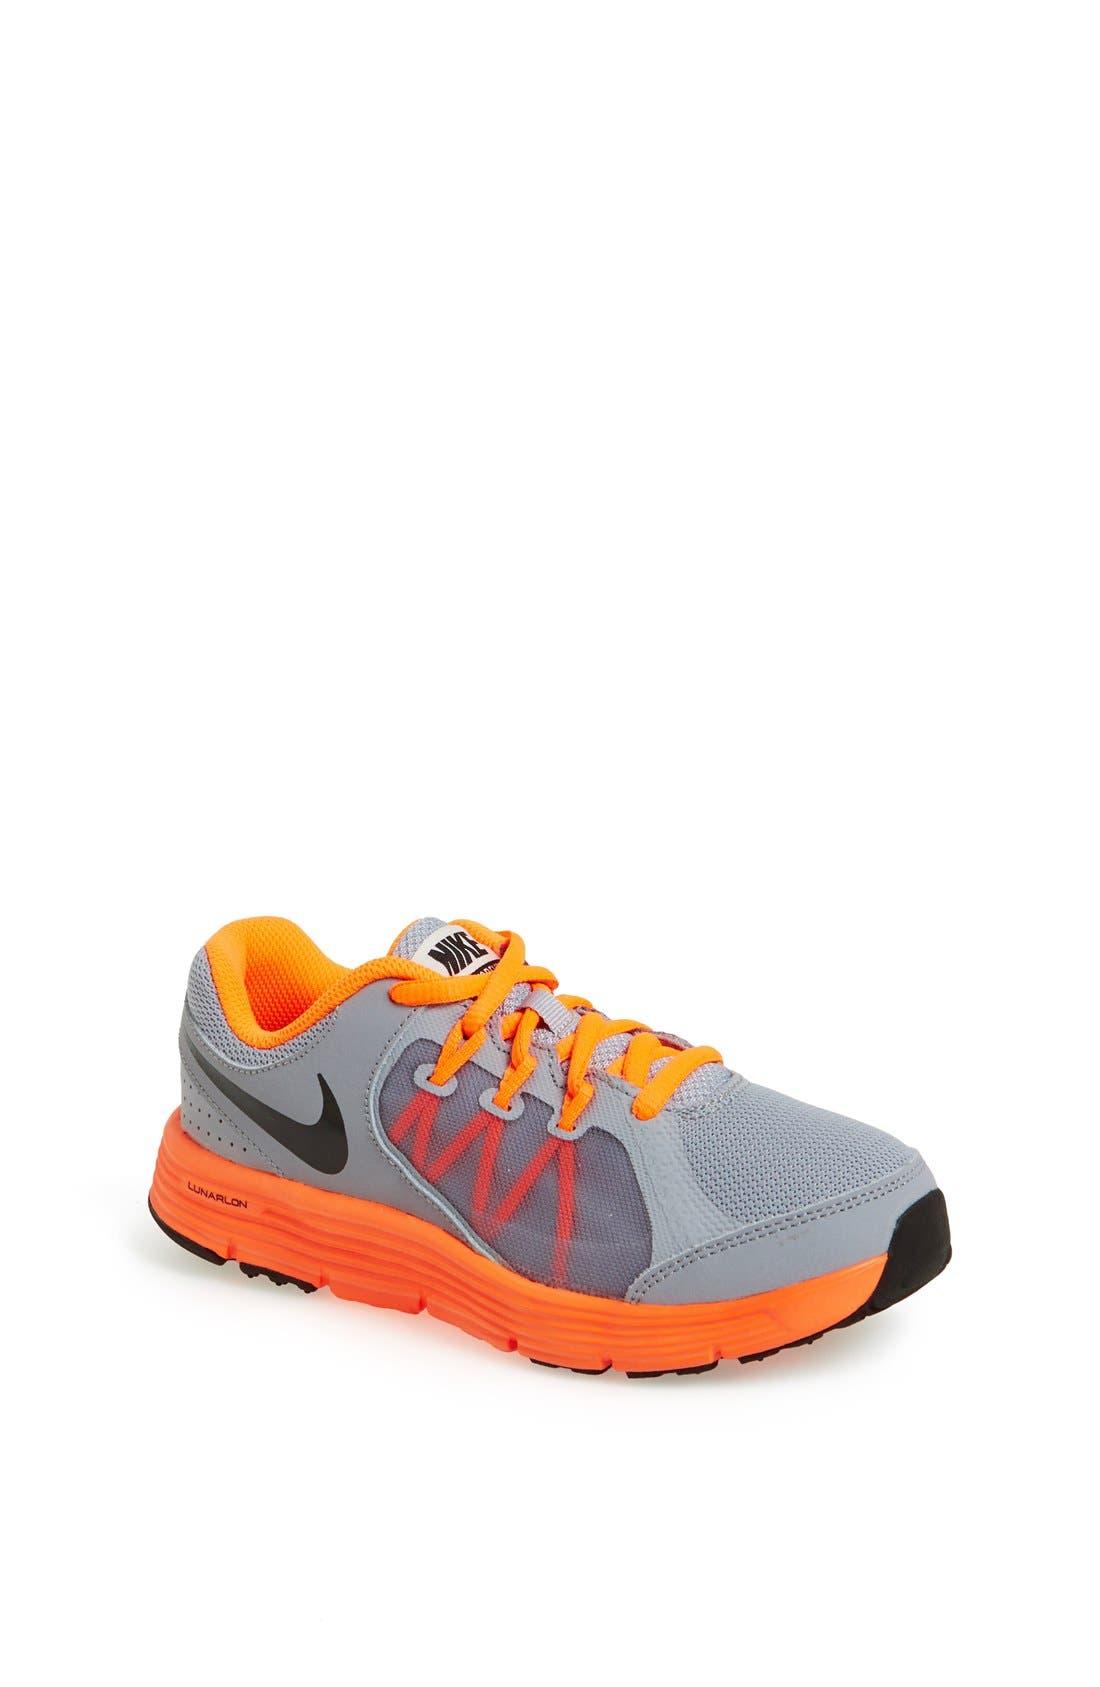 Main Image - Nike 'Lunar Forever 3' Running Shoe (Toddler & Little Kid)